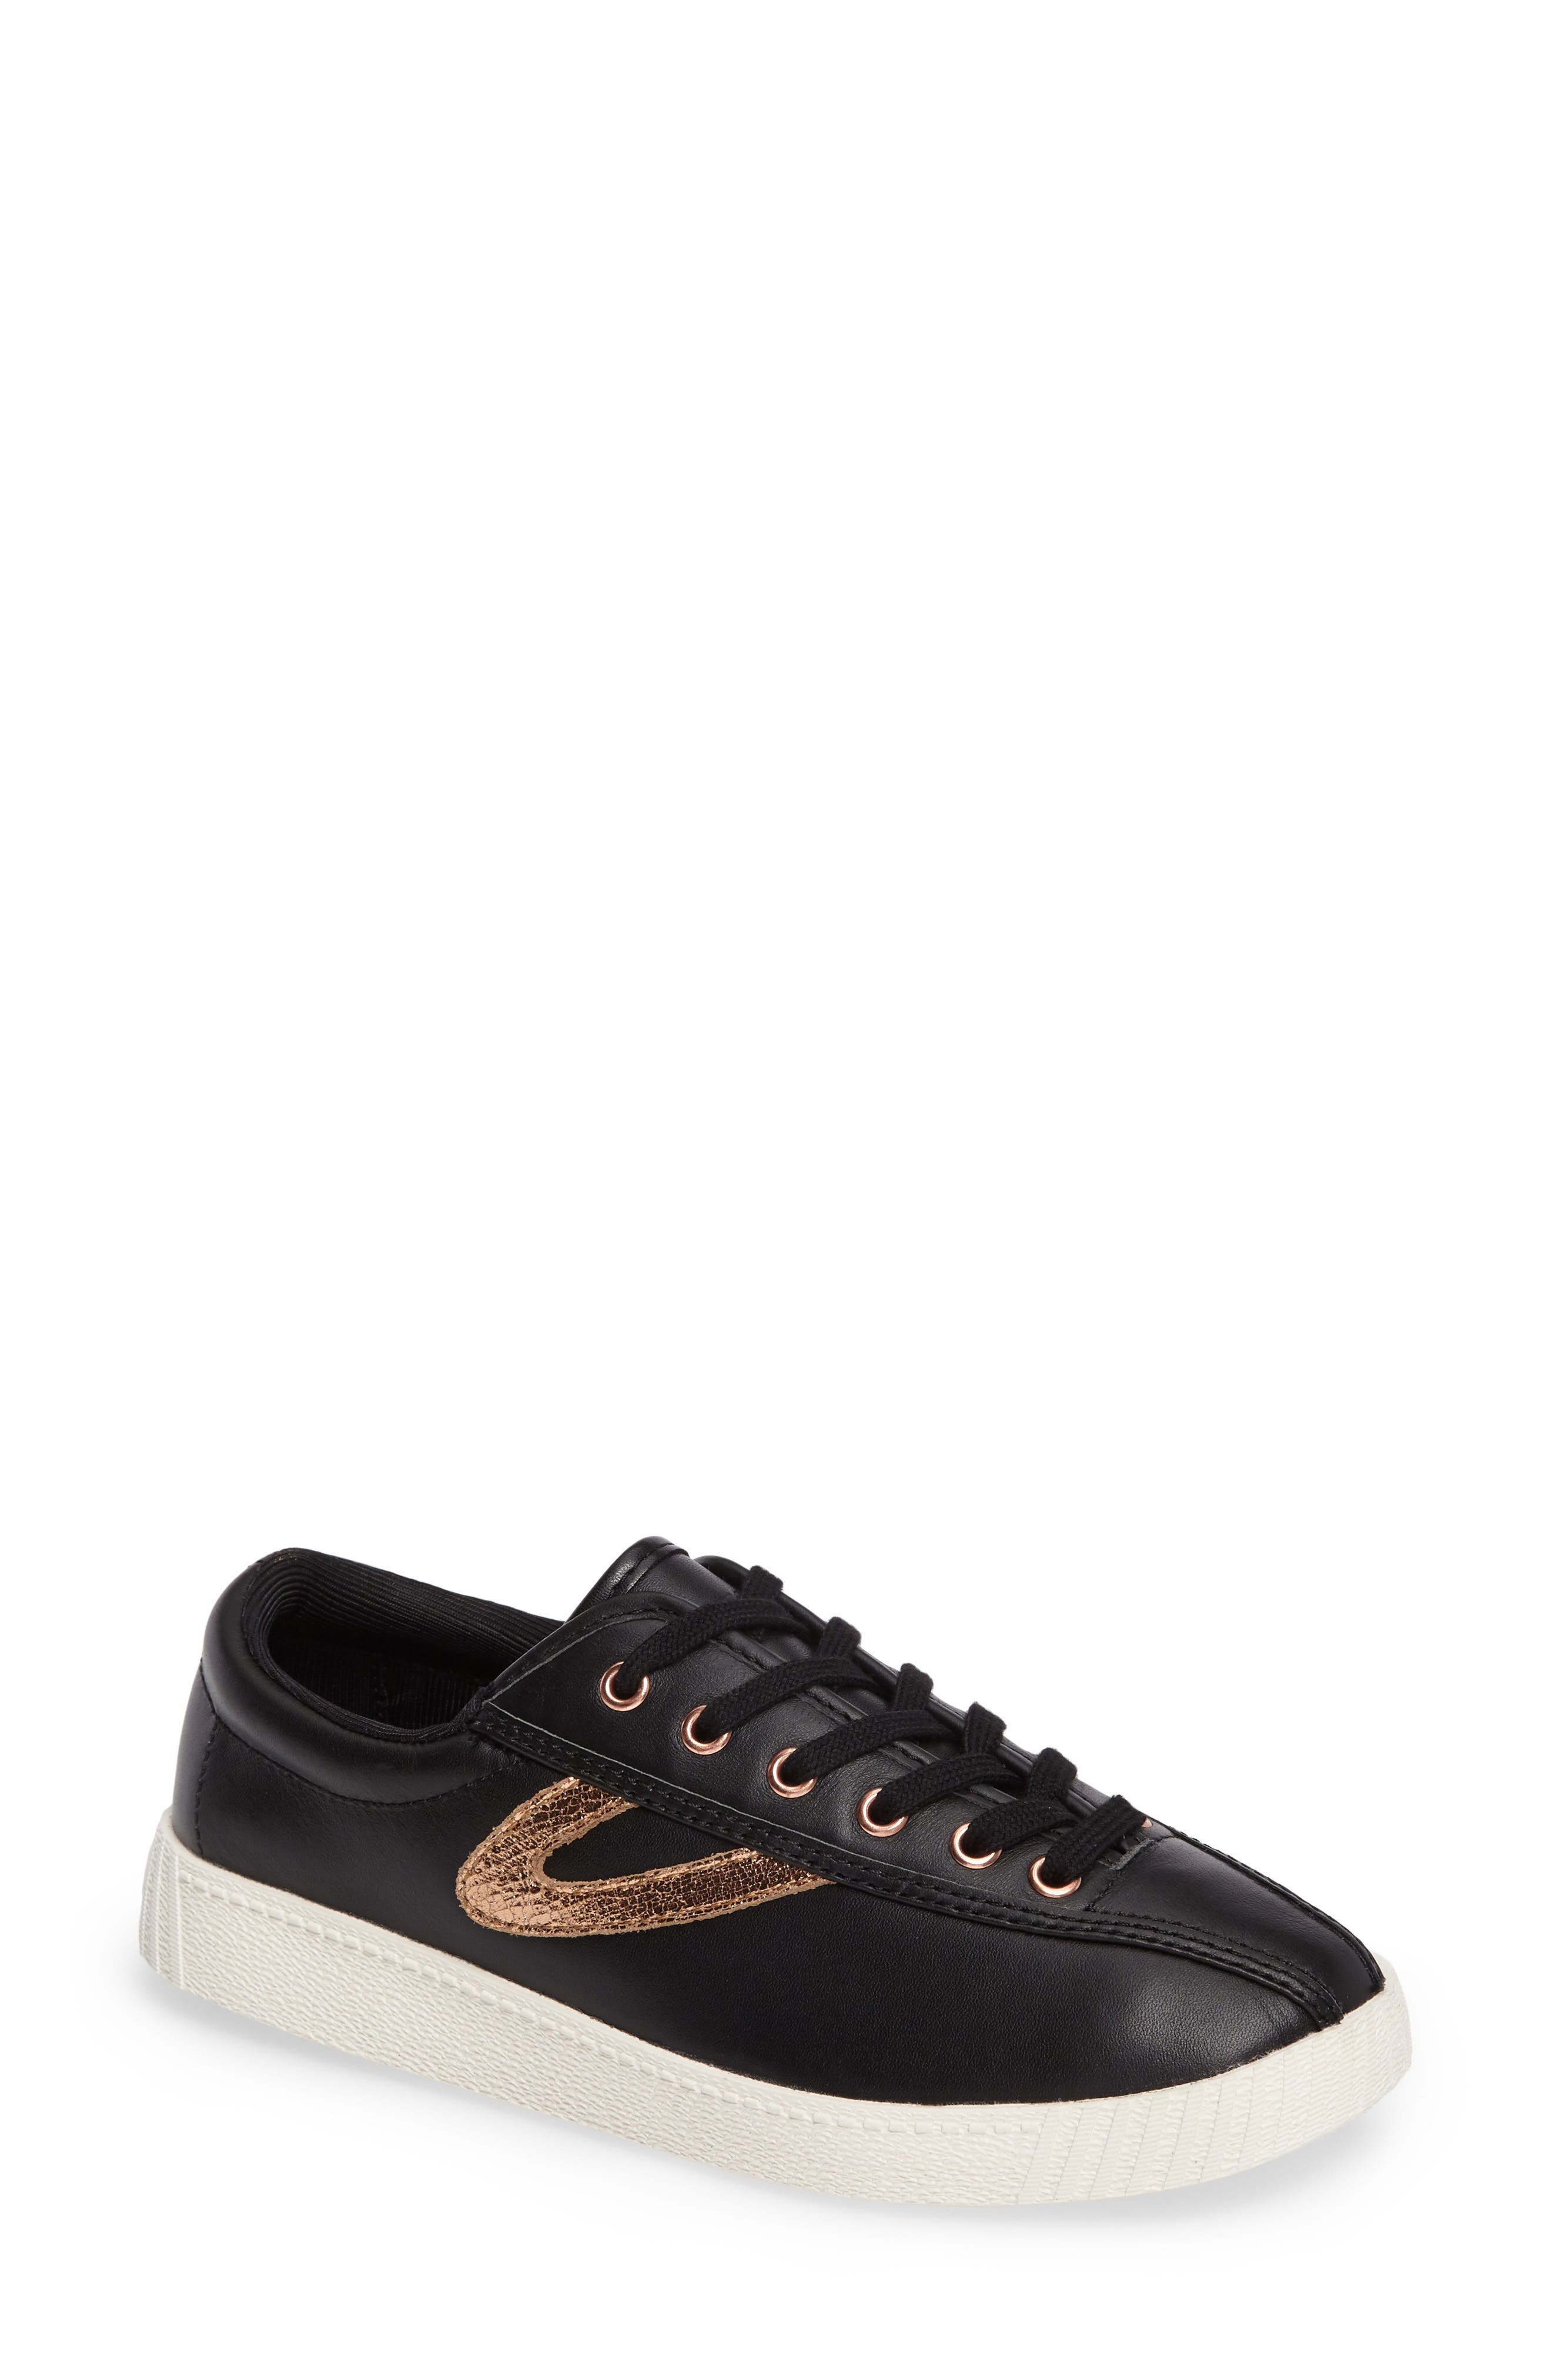 TRETORN Nylite2 Plus Sneaker